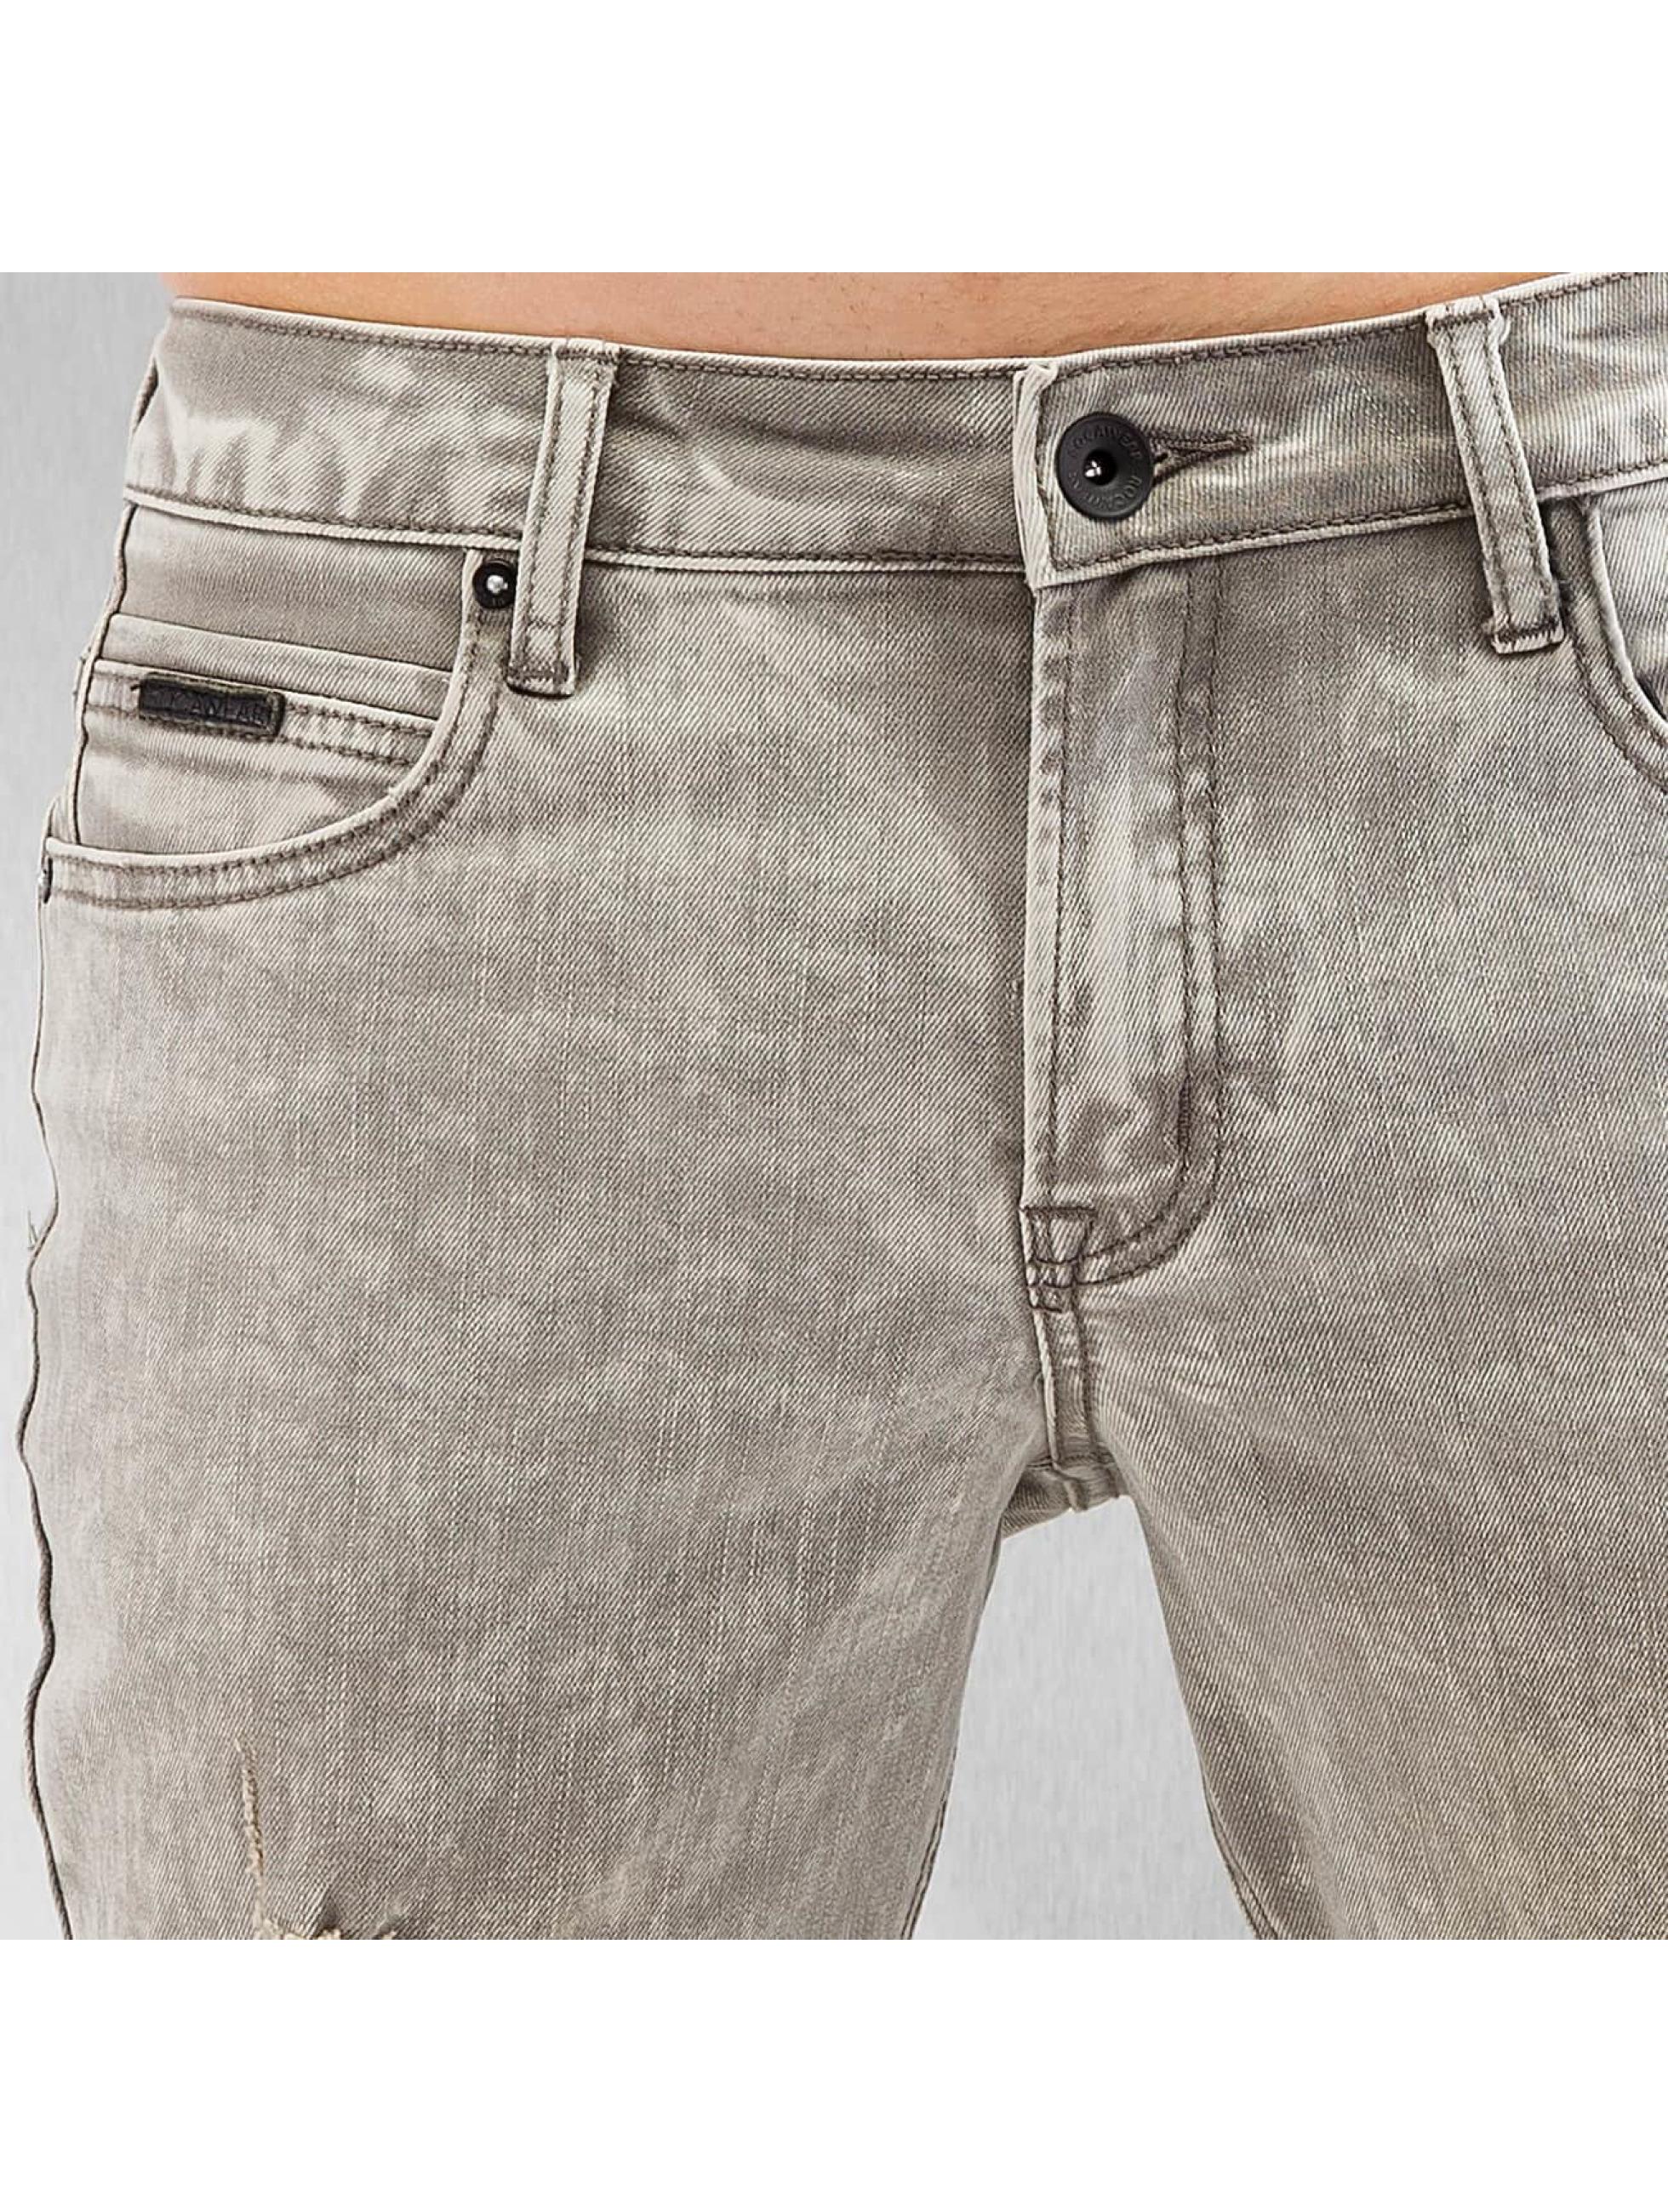 Rocawear Skinny Jeans Wash gray